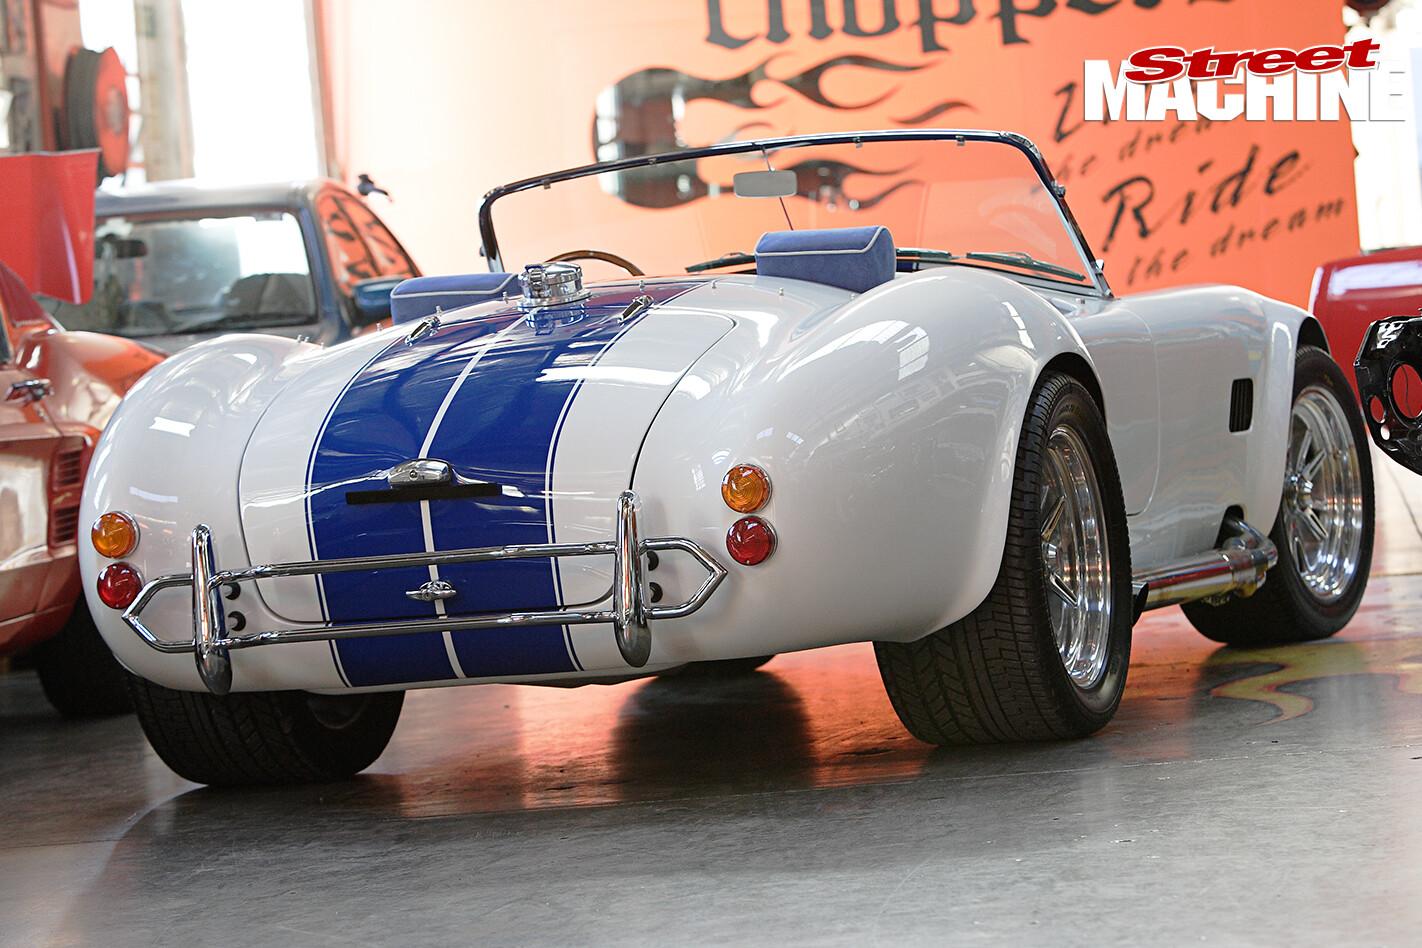 Michael -Schumacher -Cobra -Replica -rear